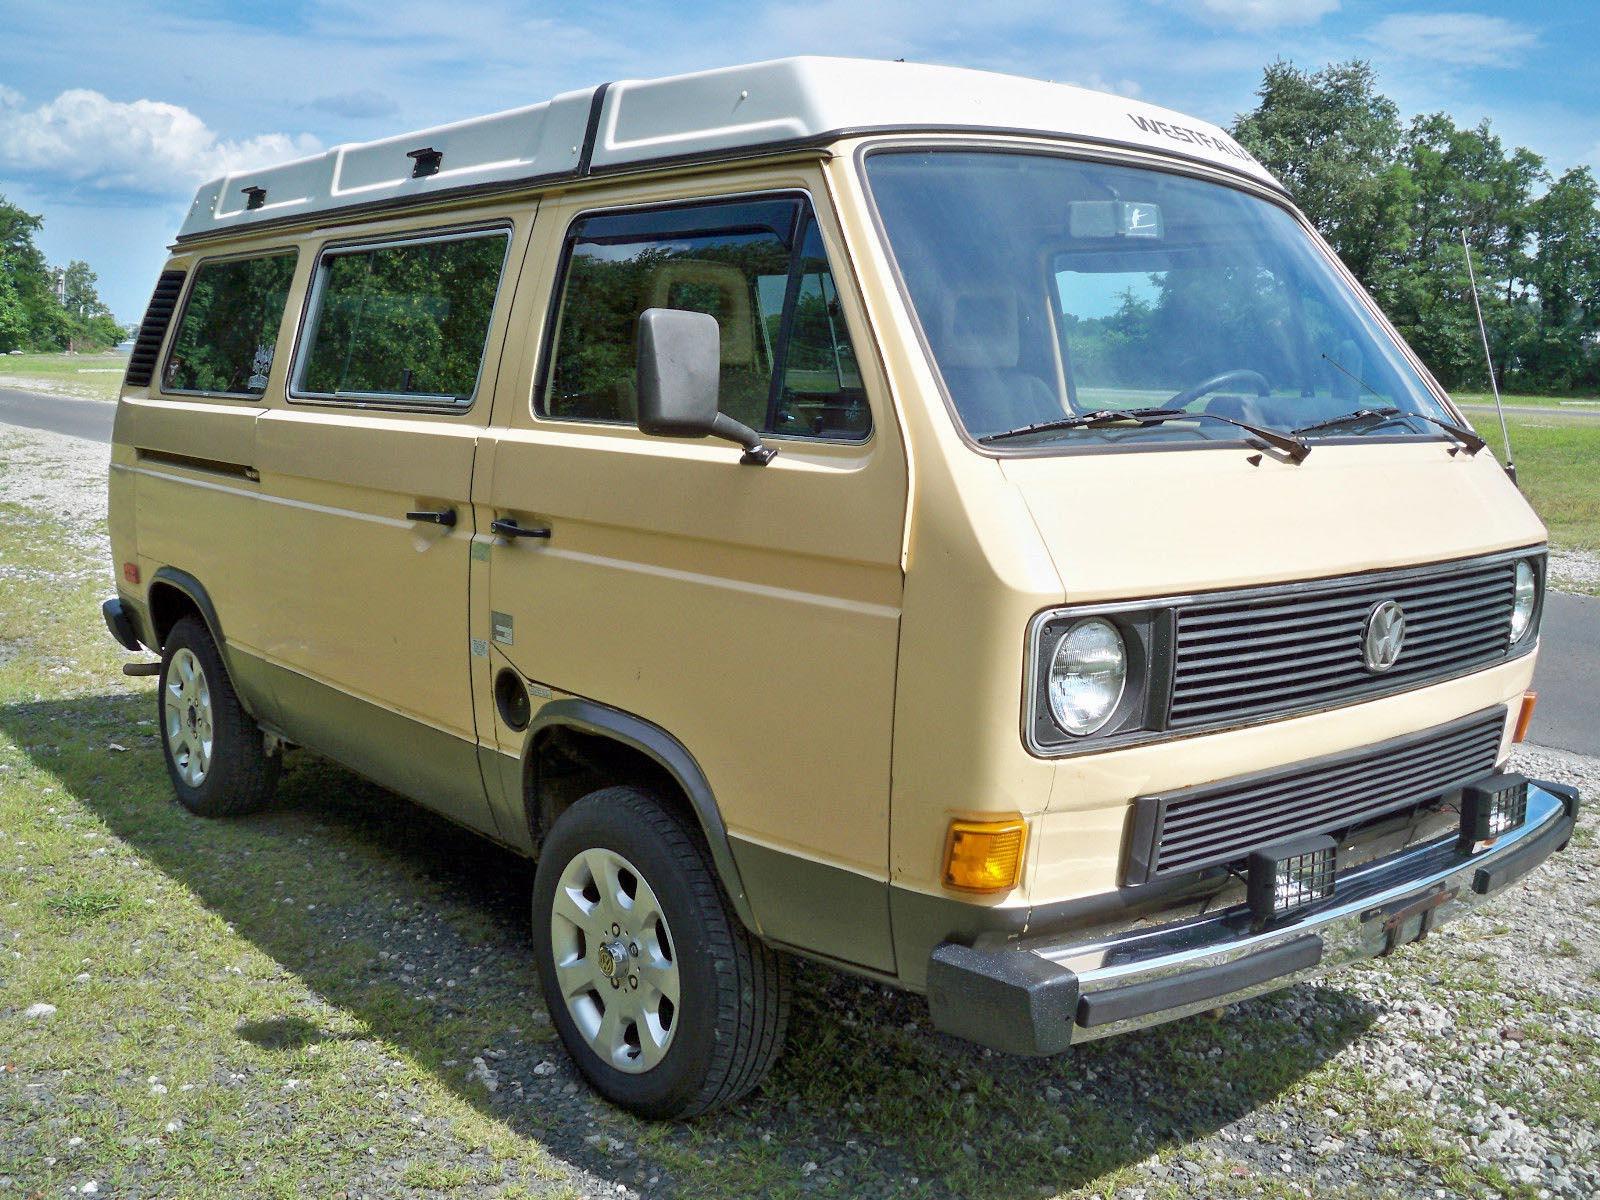 1984 Volkswagen Vanagon Reviews - Carsurvey.org